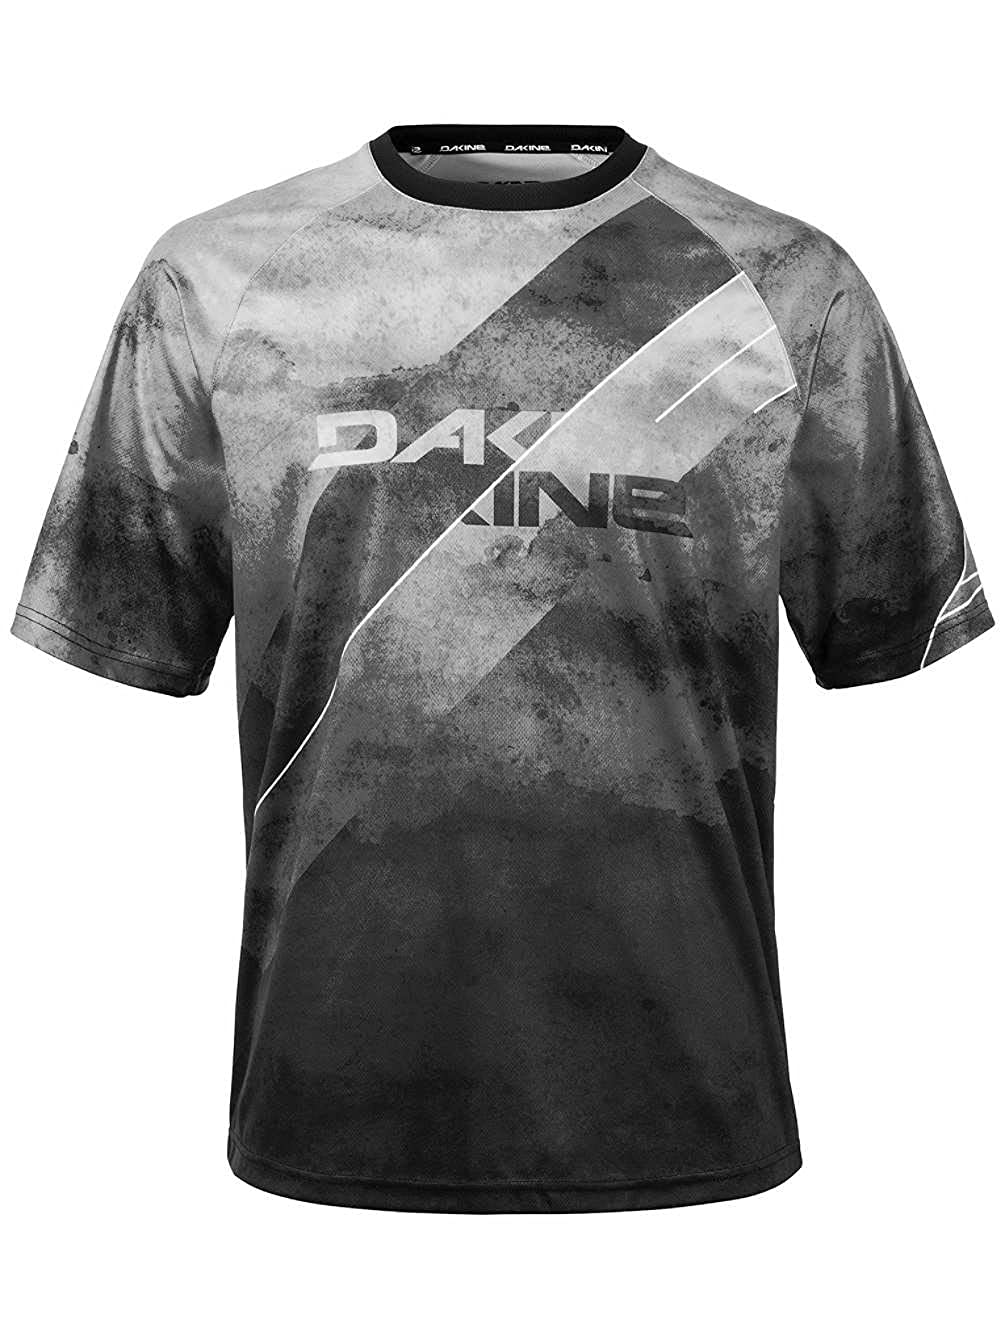 Dakine SHIRT メンズ Small ブラック/ホワイト B079TJWPJR